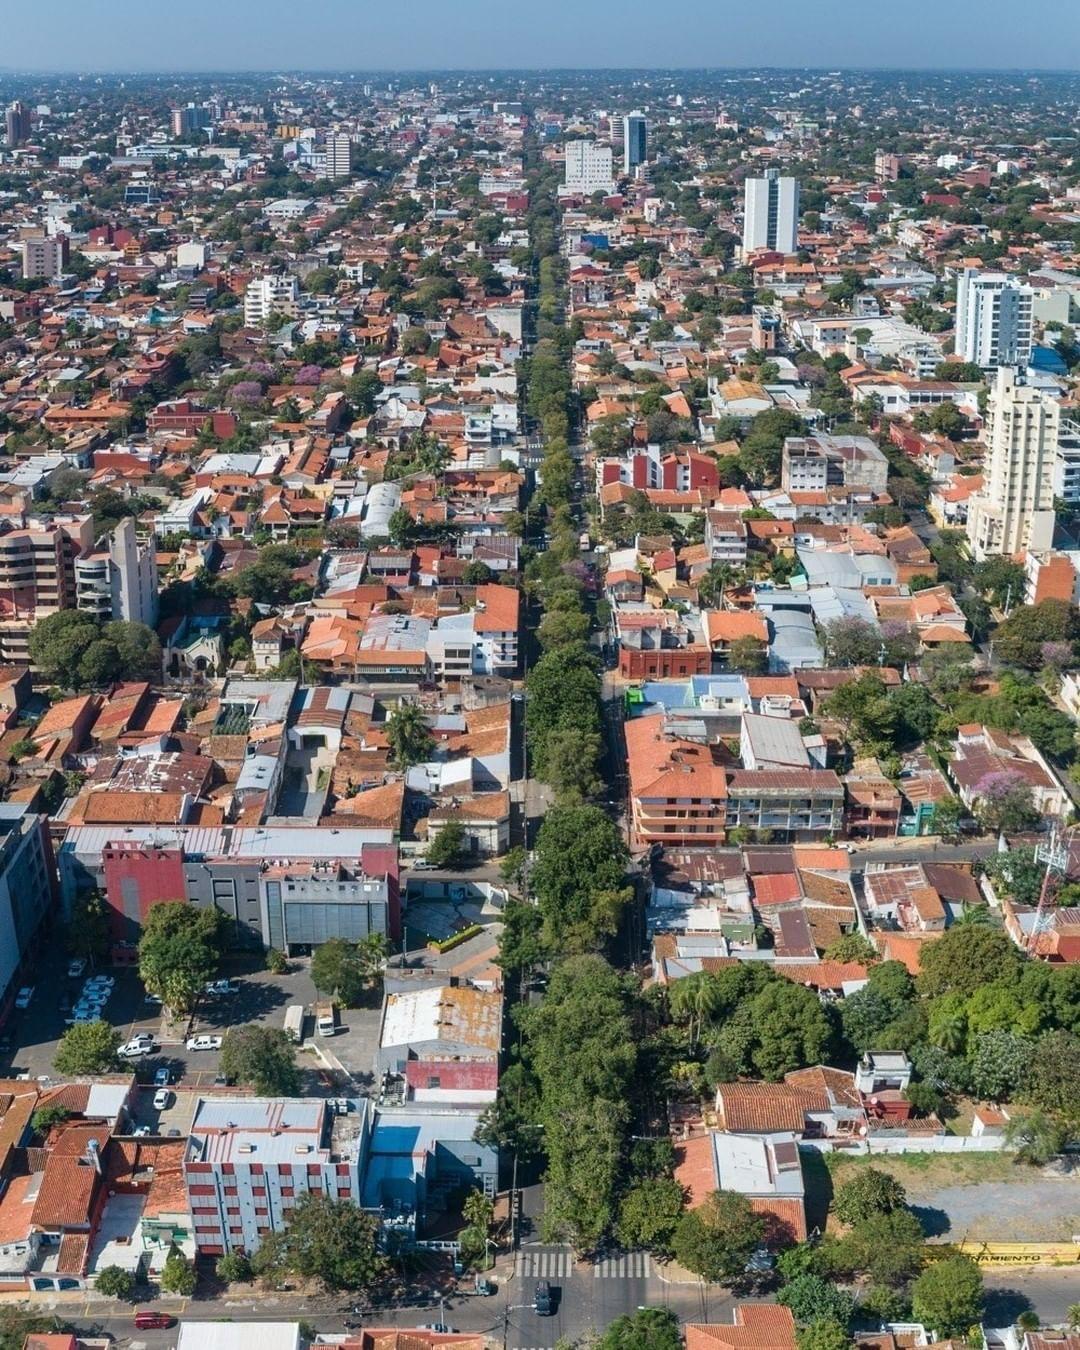 Fotociclo On Instagram Asuncion Del Paraguay Capital De Mis Amores Avenida Ygatimi Asuncion Paraguay Fotografia America Do Sul City City Photo